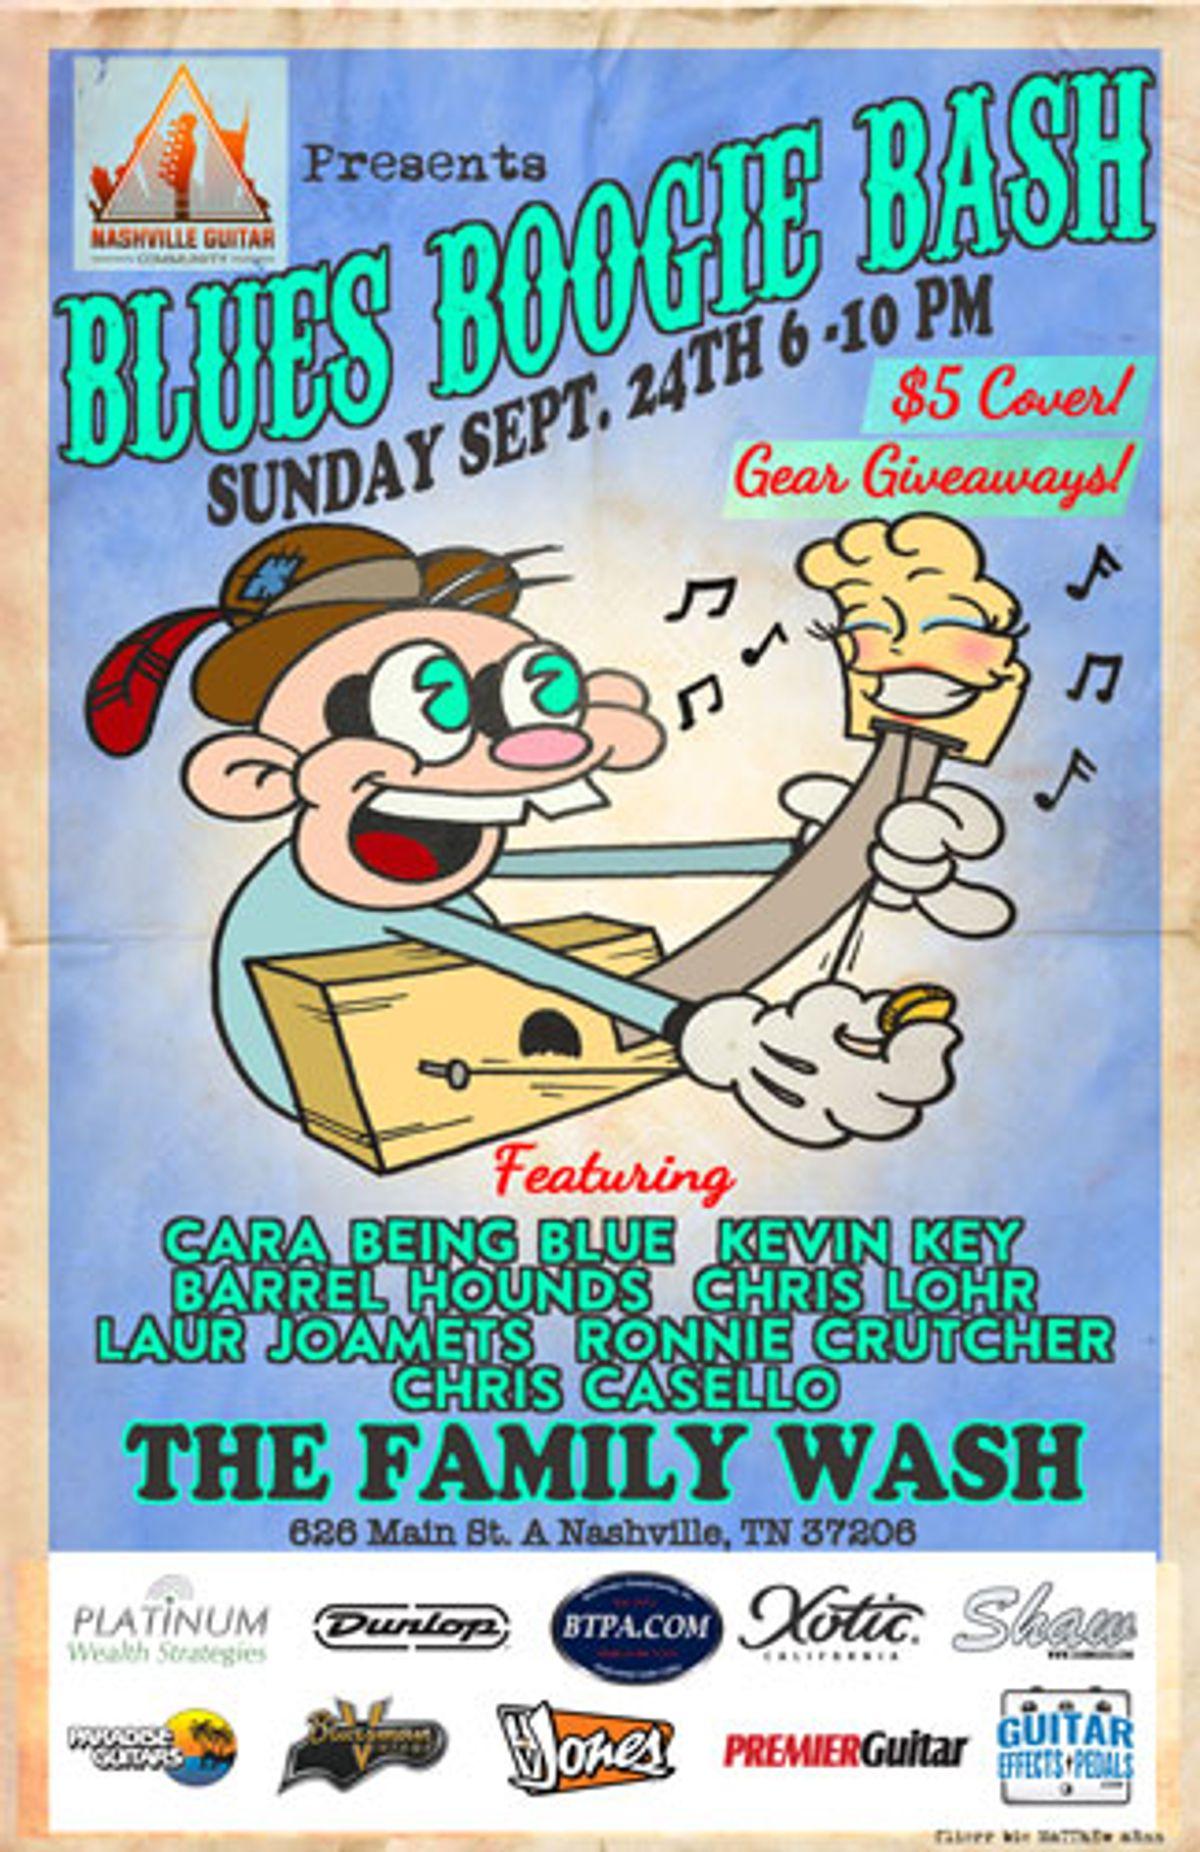 Nashville Guitar Community Presents the Blues Boogie Bash